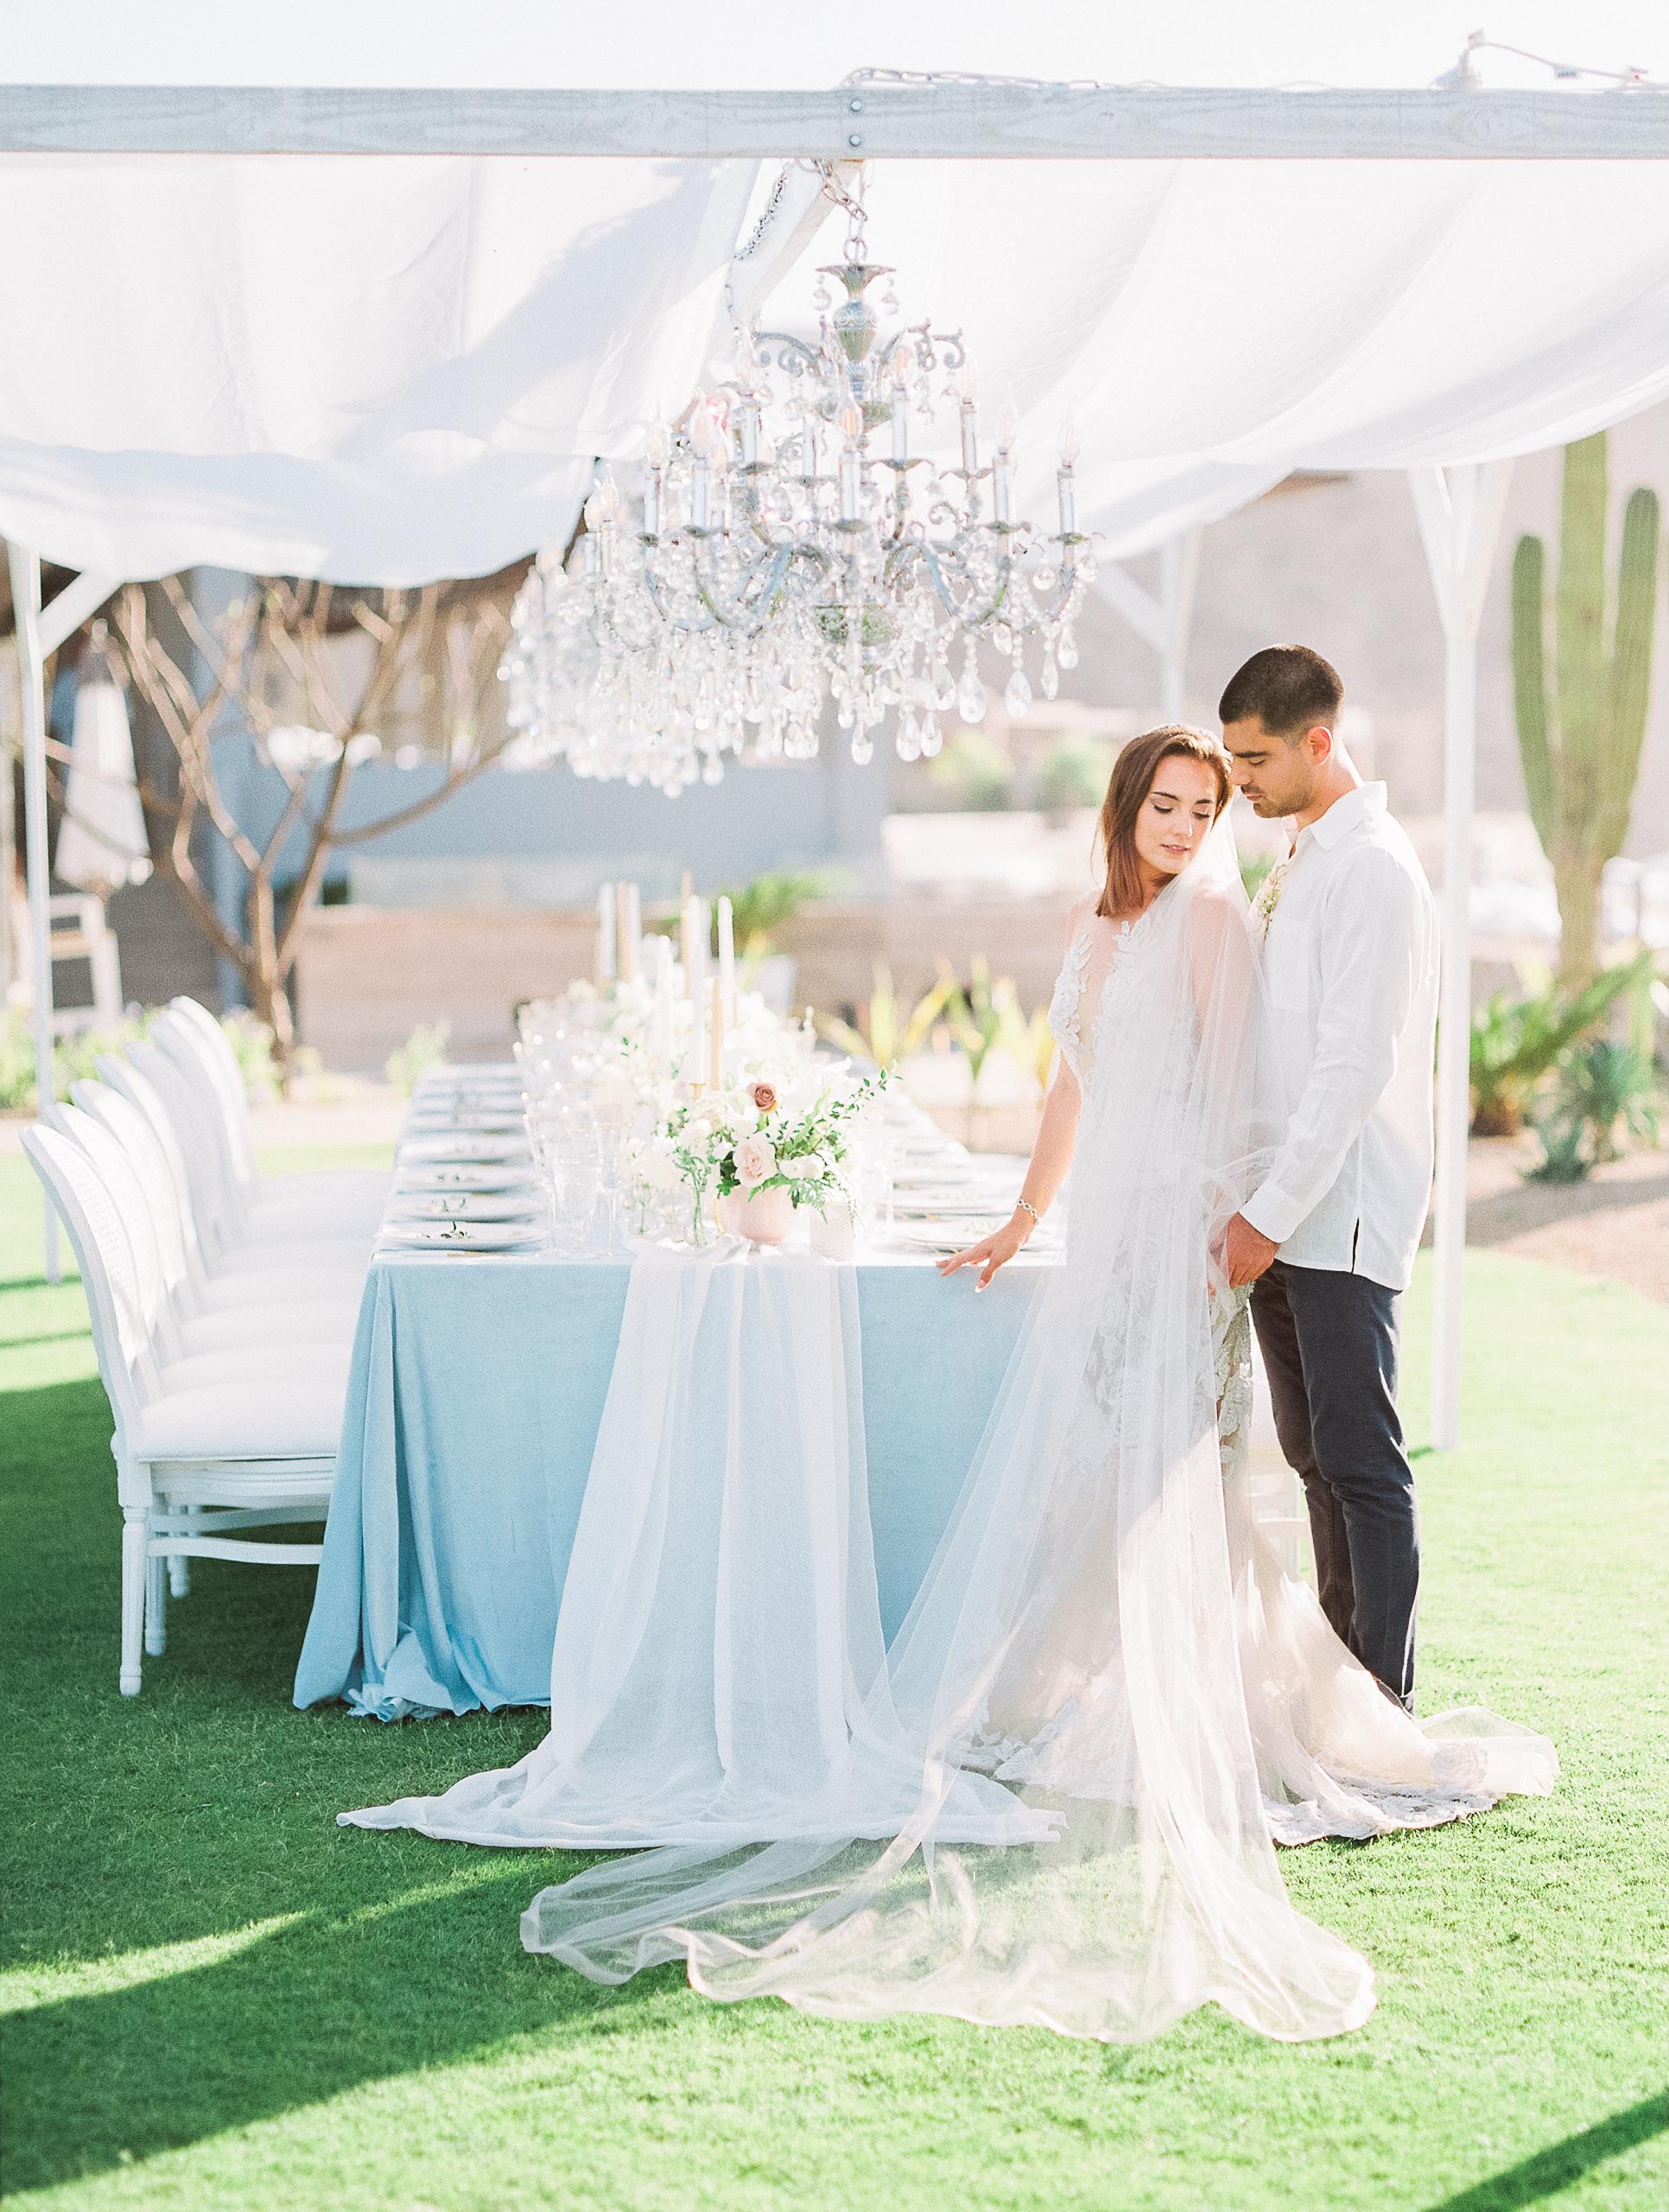 Montage-Wedding-Photos-Cabo-JBJ-Pictures-234.jpg